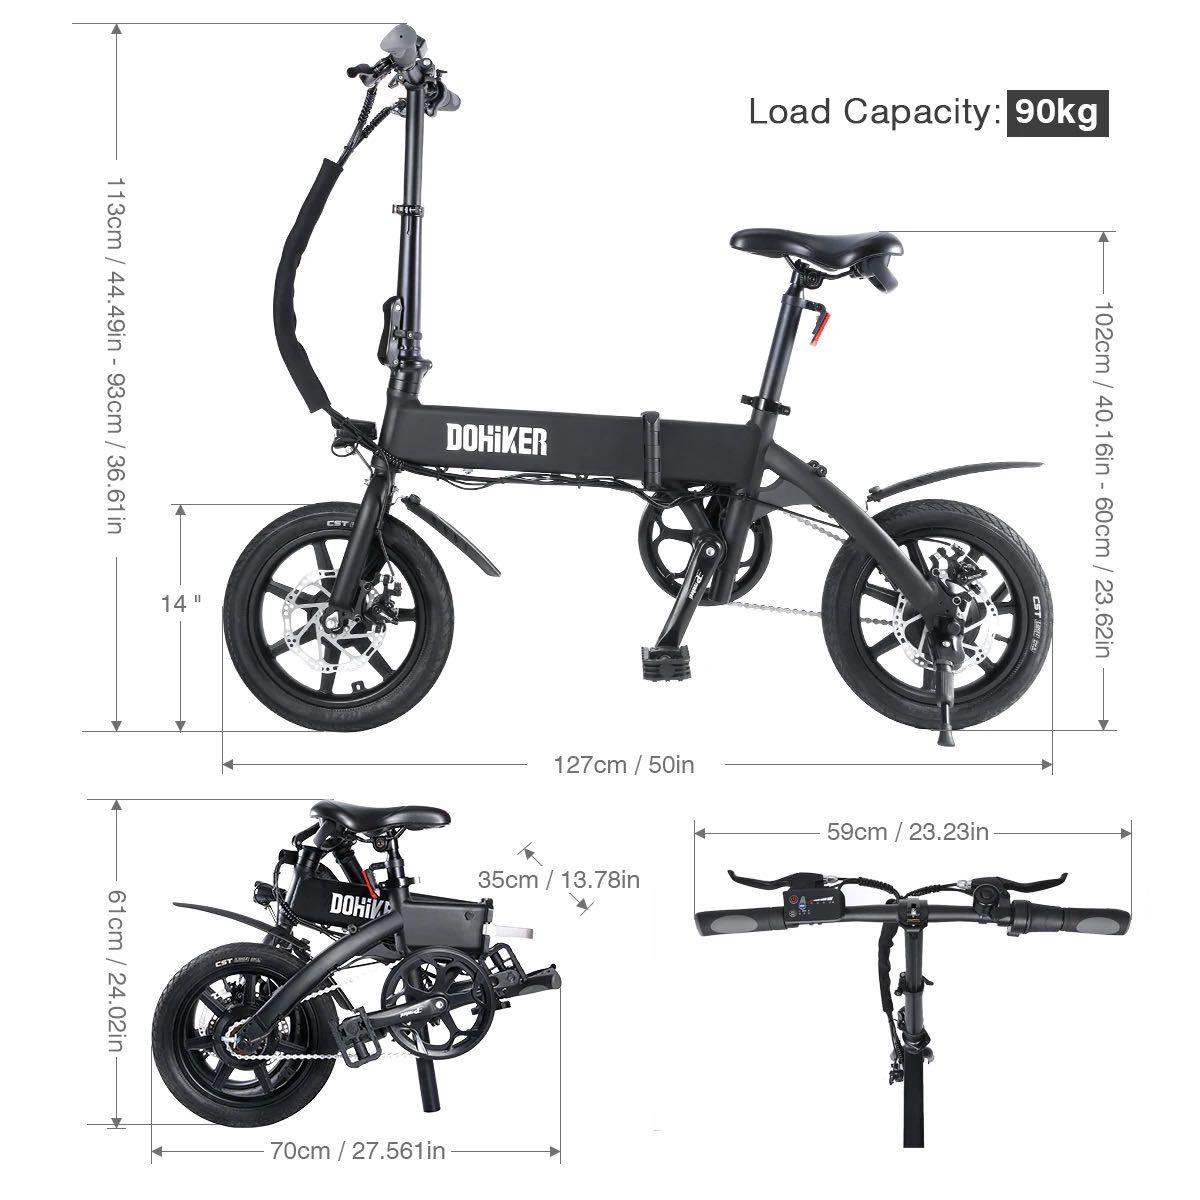 offerta bici elettrica pieghevole dohiker